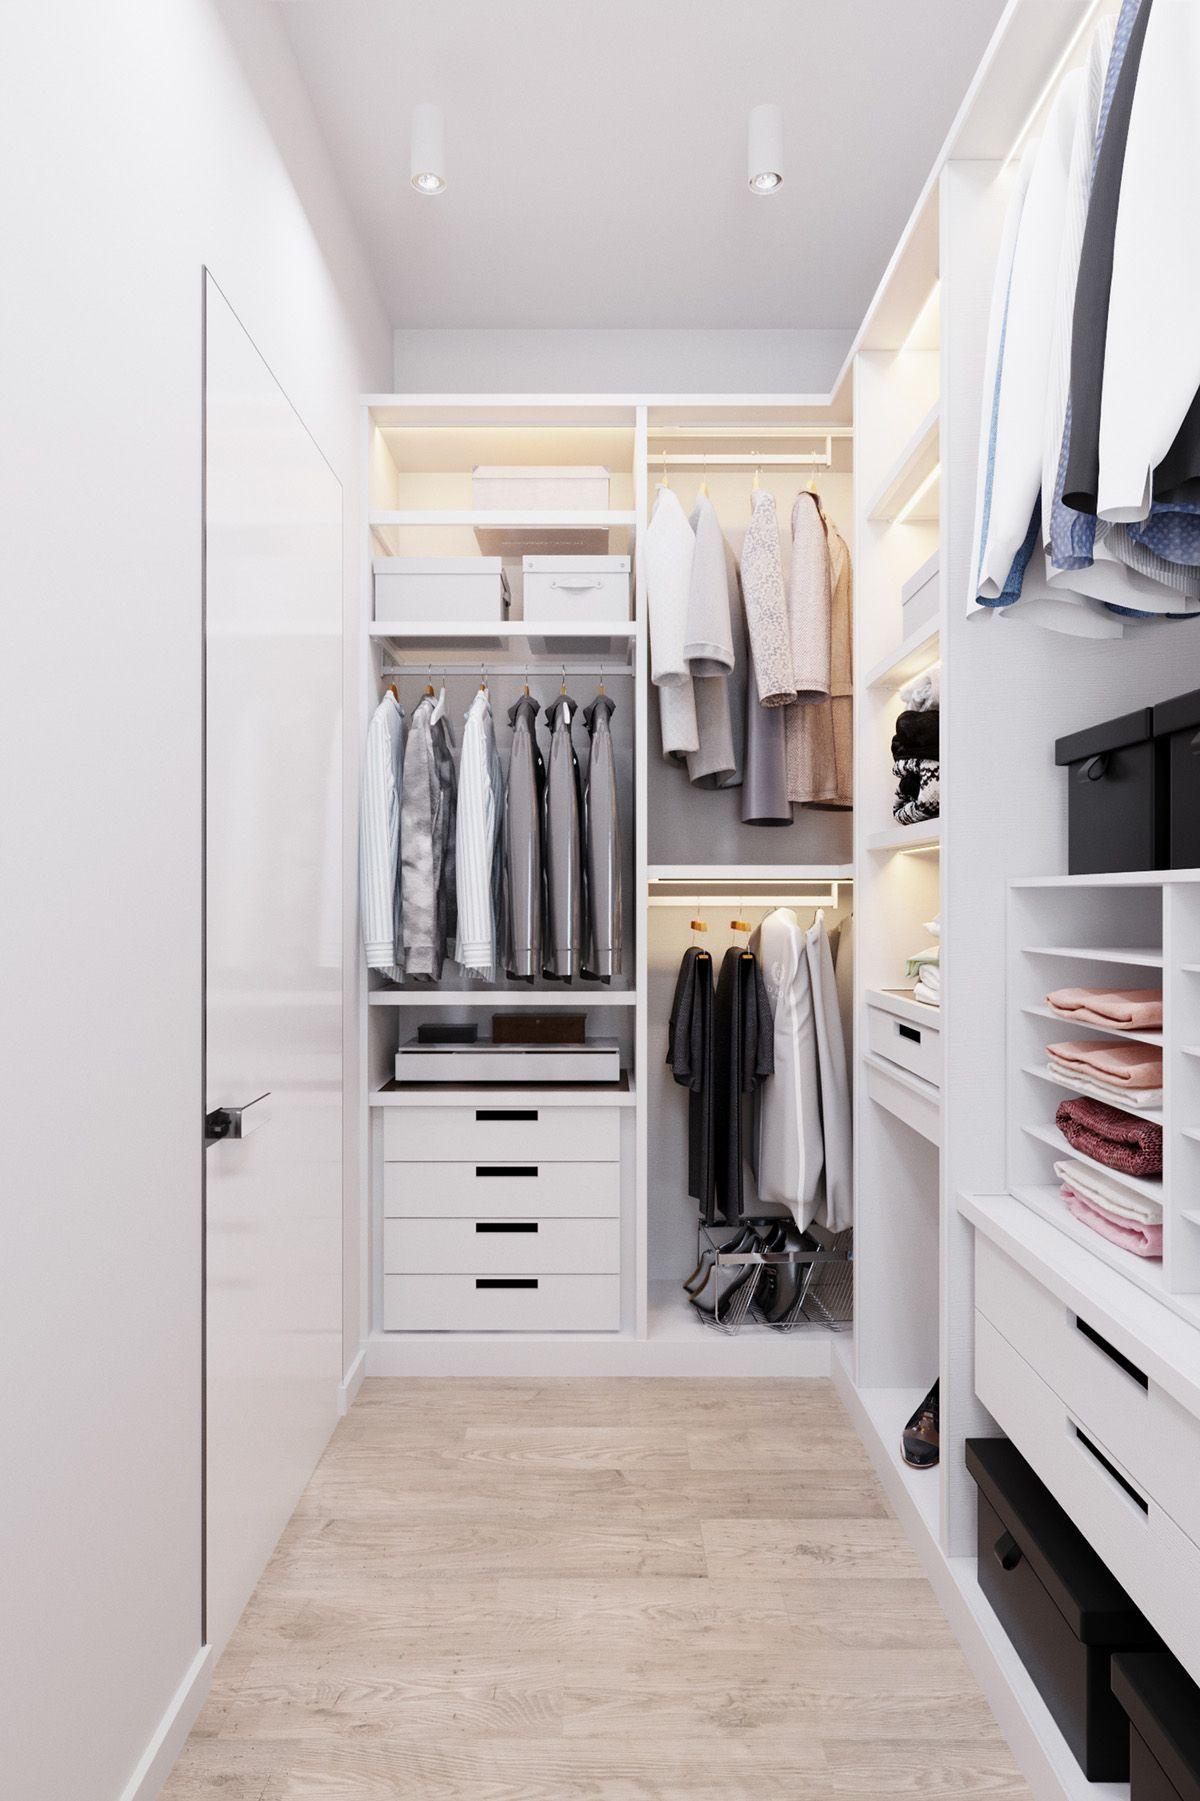 Zwei Grosse Skandinavische Hauser Fur Junge Familien Futuristischesdesign H Familien Fur Futu In 2020 Bedroom Closet Design Walk In Closet Design Closet Designs